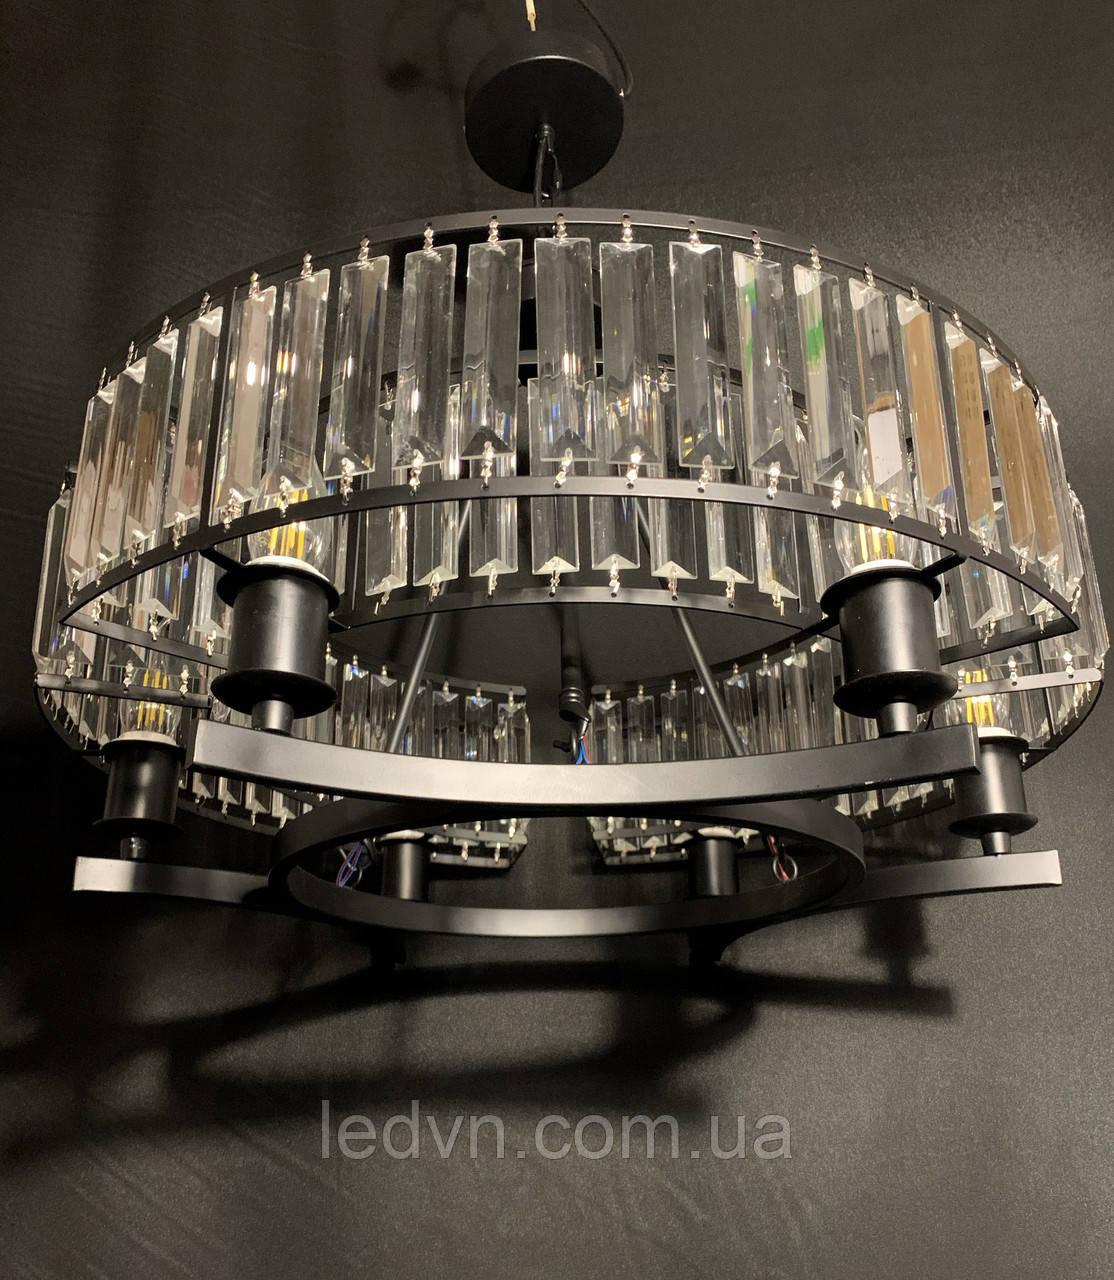 Шикарная современная хрустальная люстра на 6 ламп черная